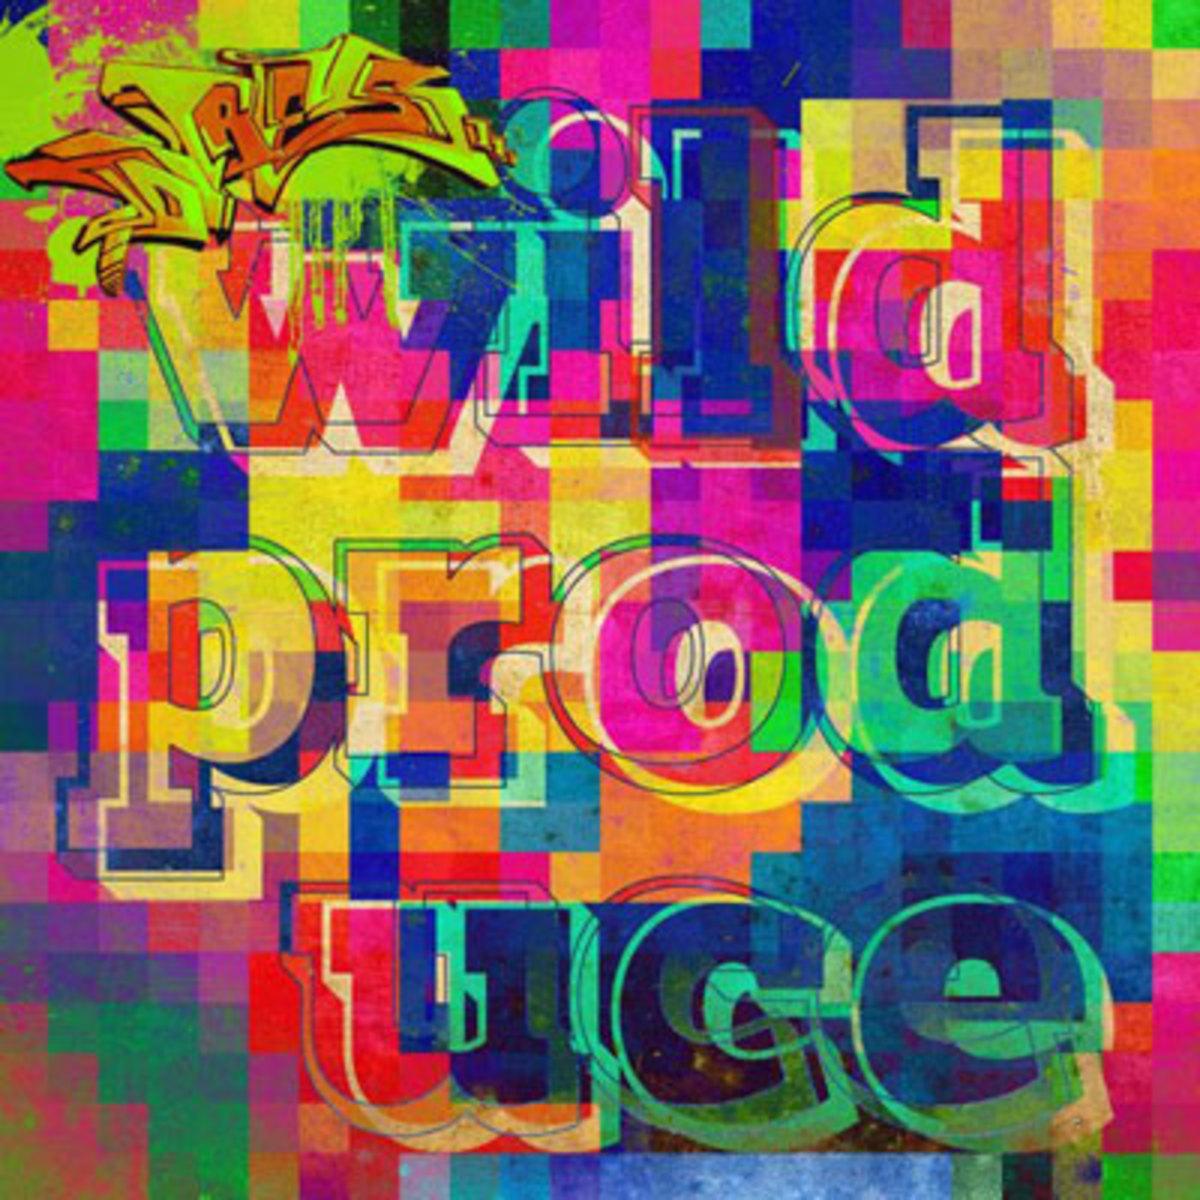 dres-wildproduce.jpg